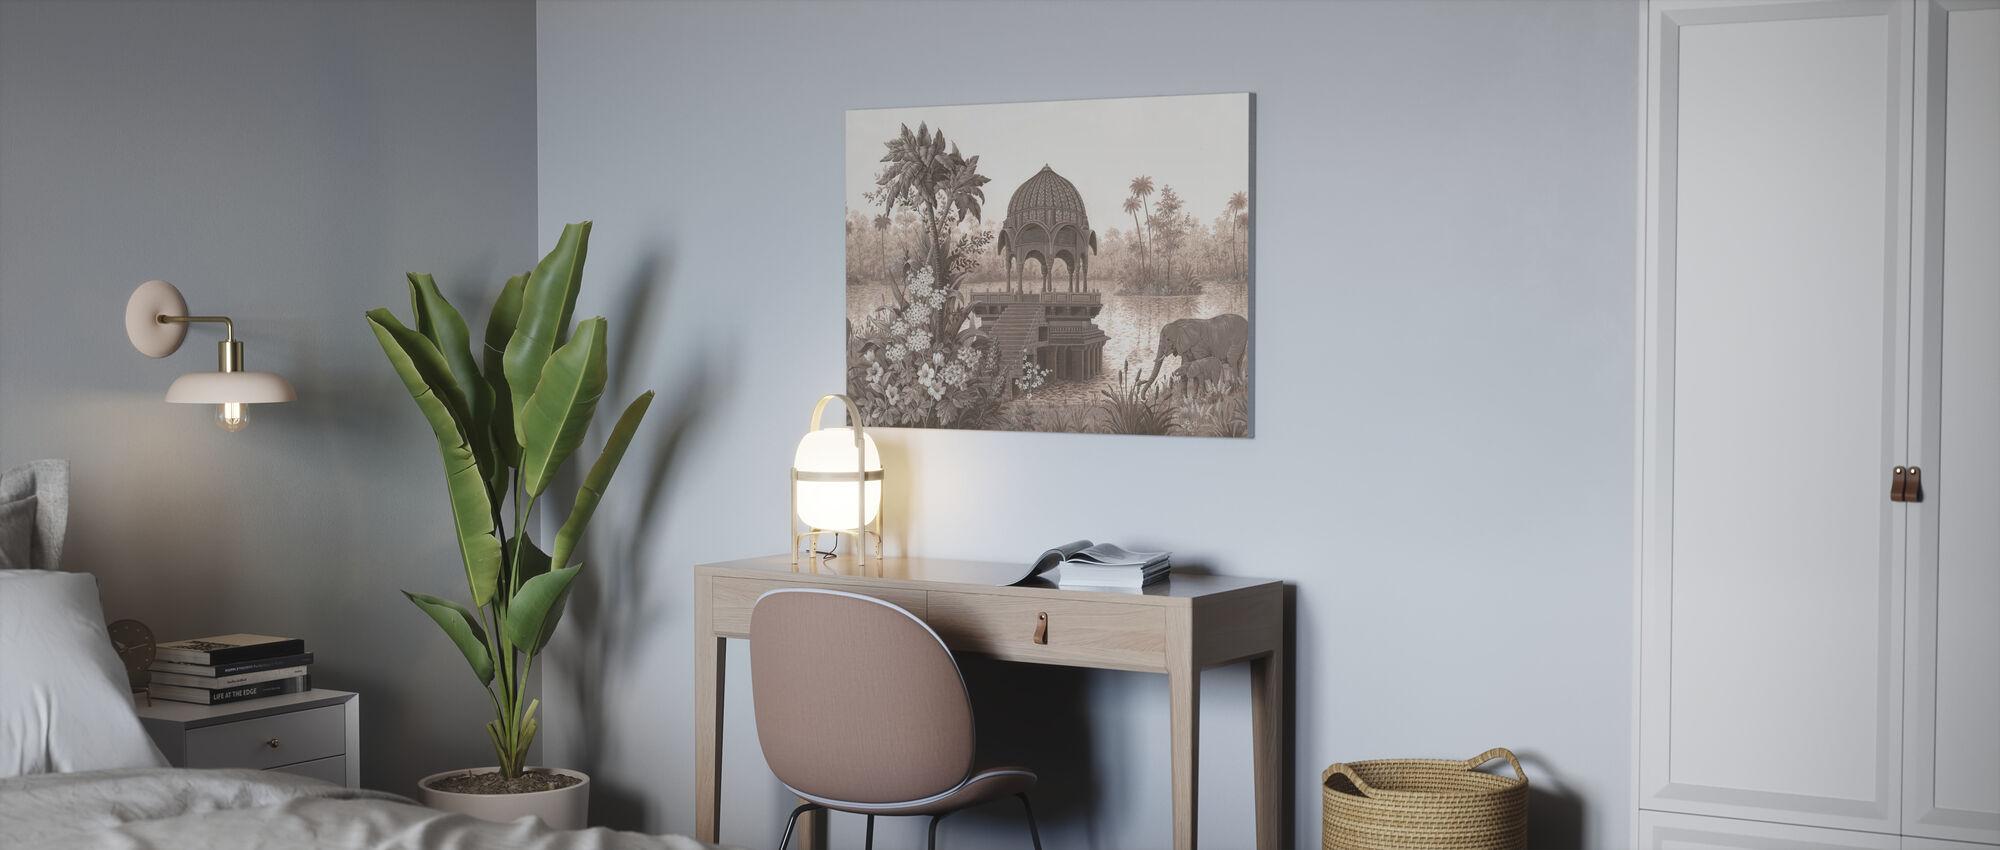 Tropical Habitat - Canvas print - Office